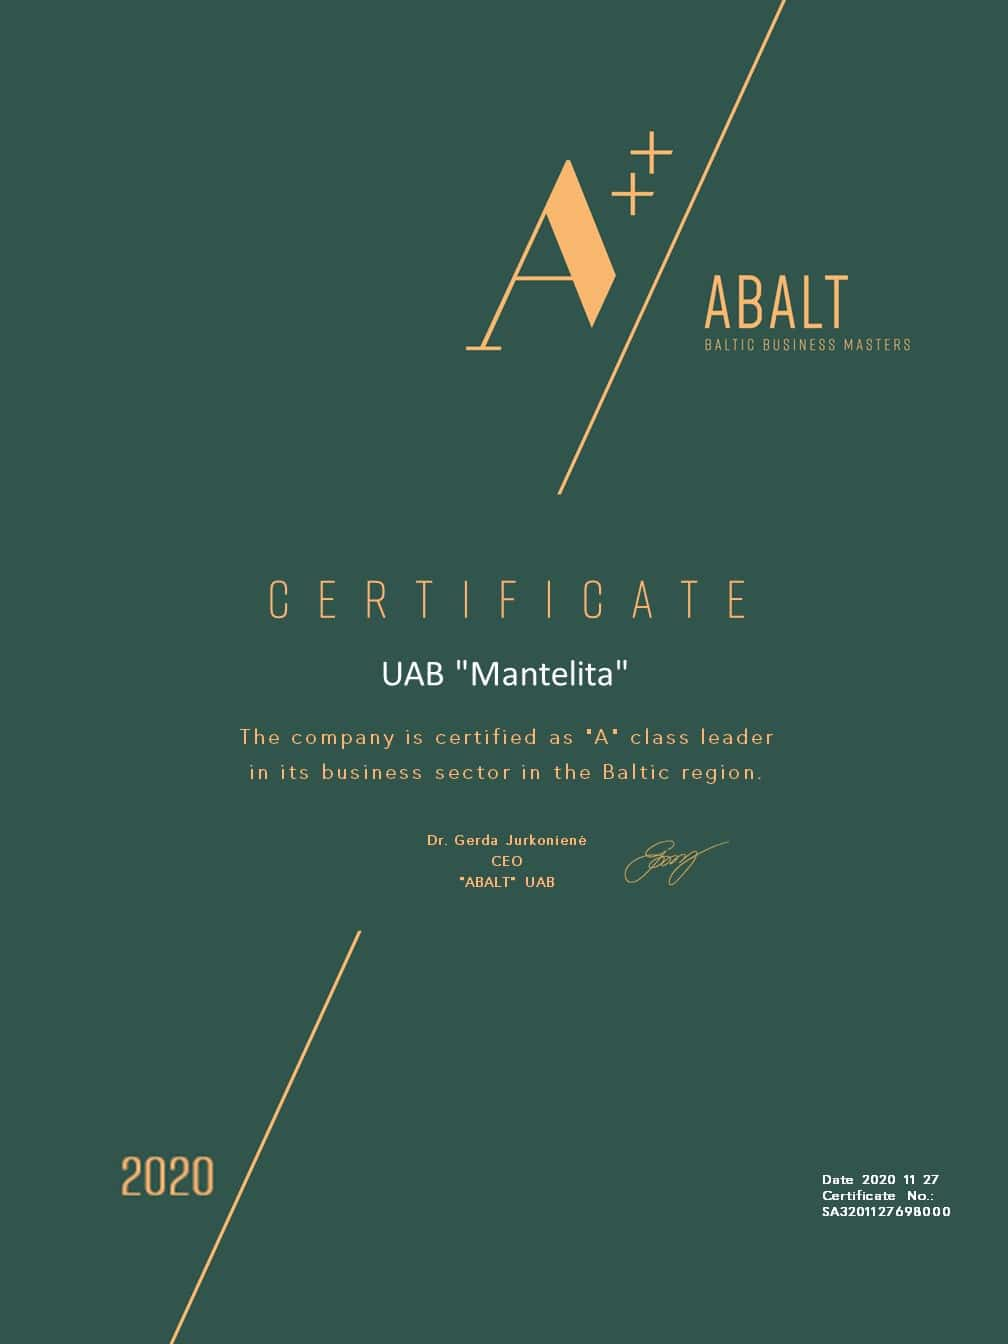 Abalt sertifikatas